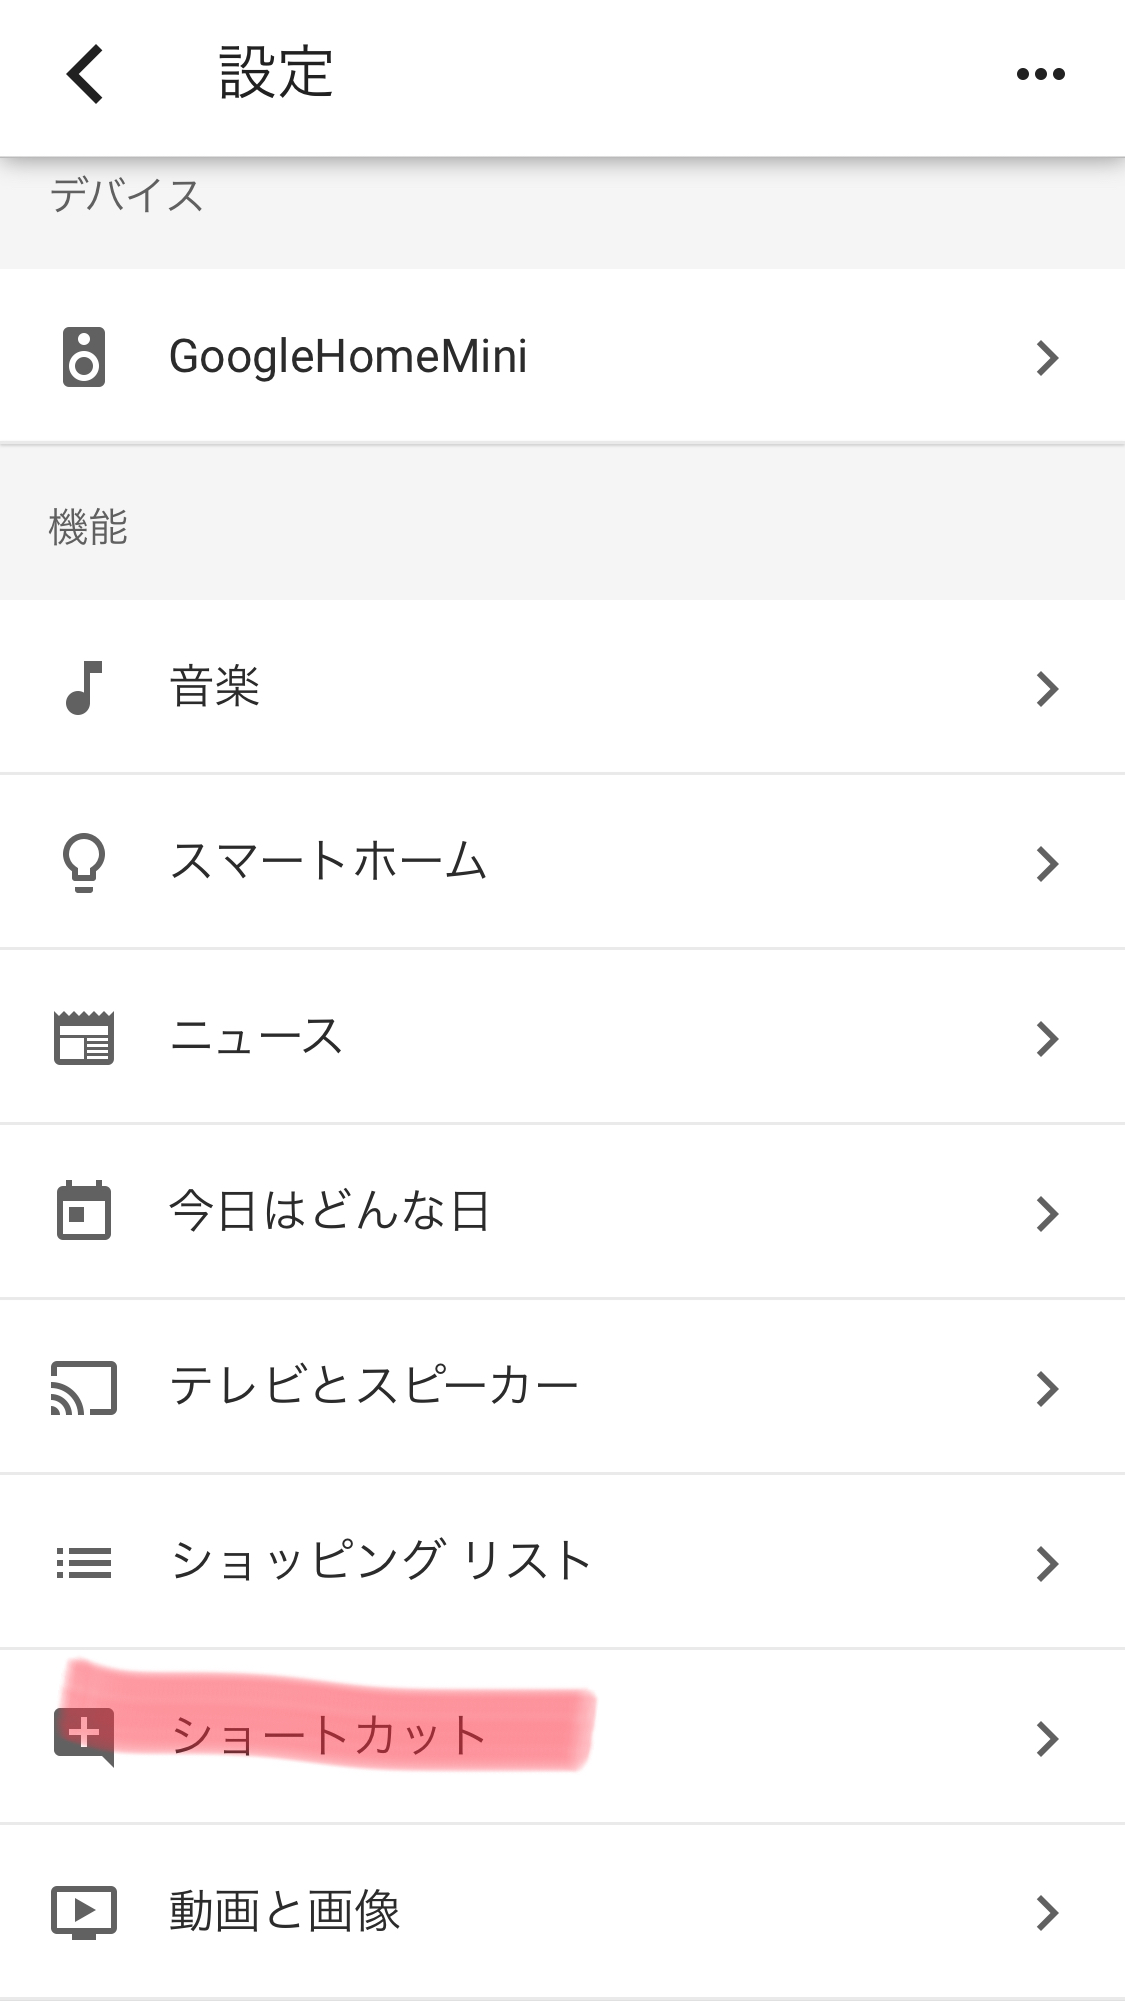 GoogleHomeMiniでRadiko(ラジコ)をストリーミング再生する方法見つけた